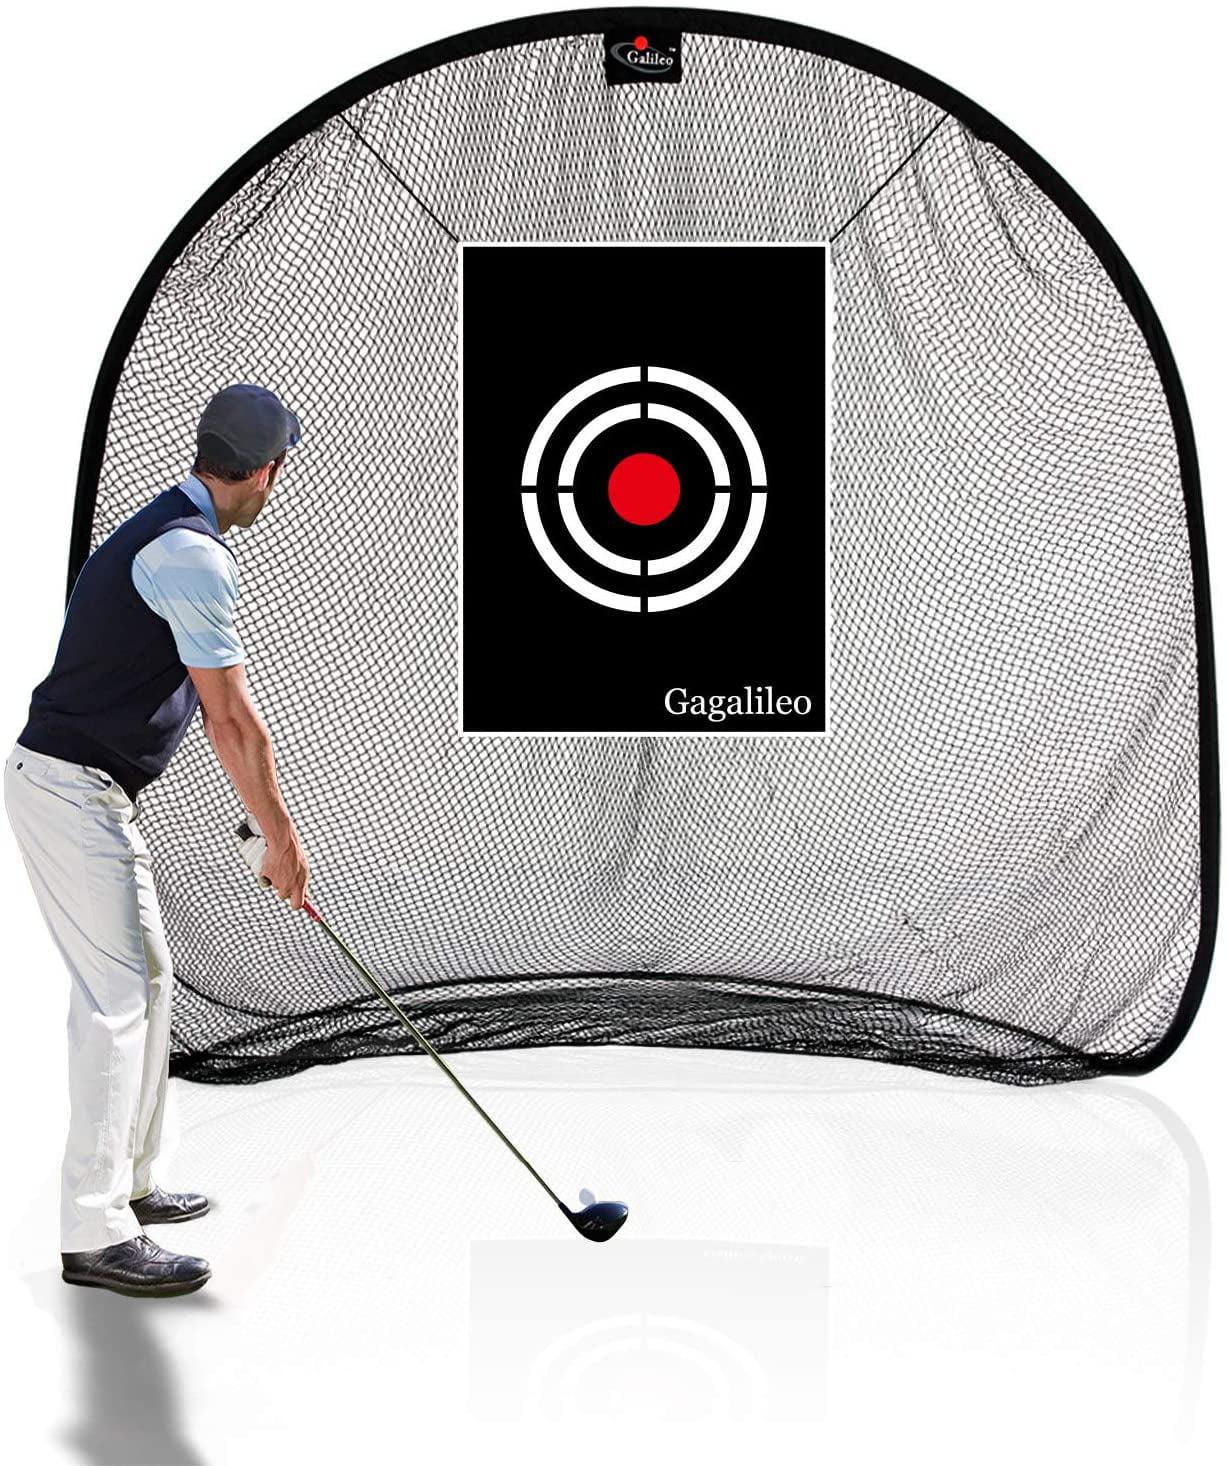 GALILEO Golf Nets Golf Practice Net Hitting Netting for ...